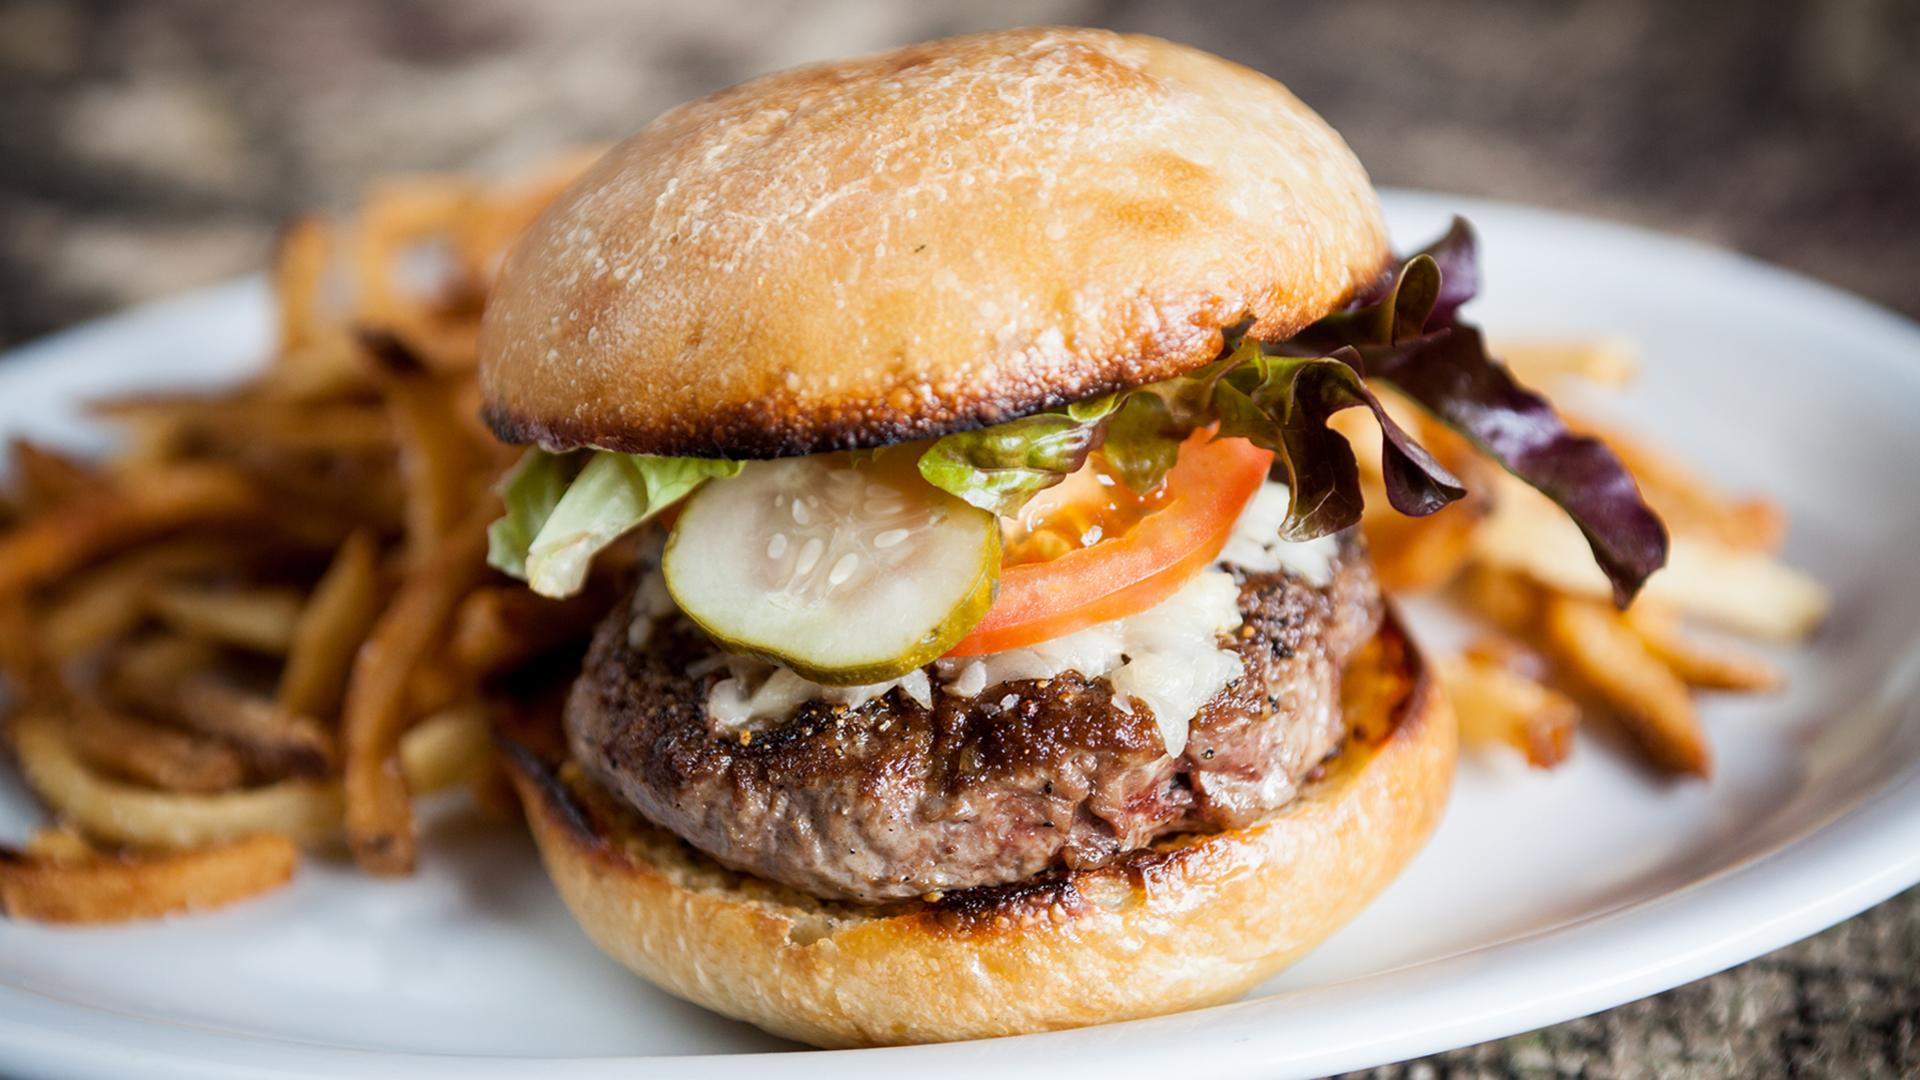 Best burgers any budget Toronto | Antler game burger